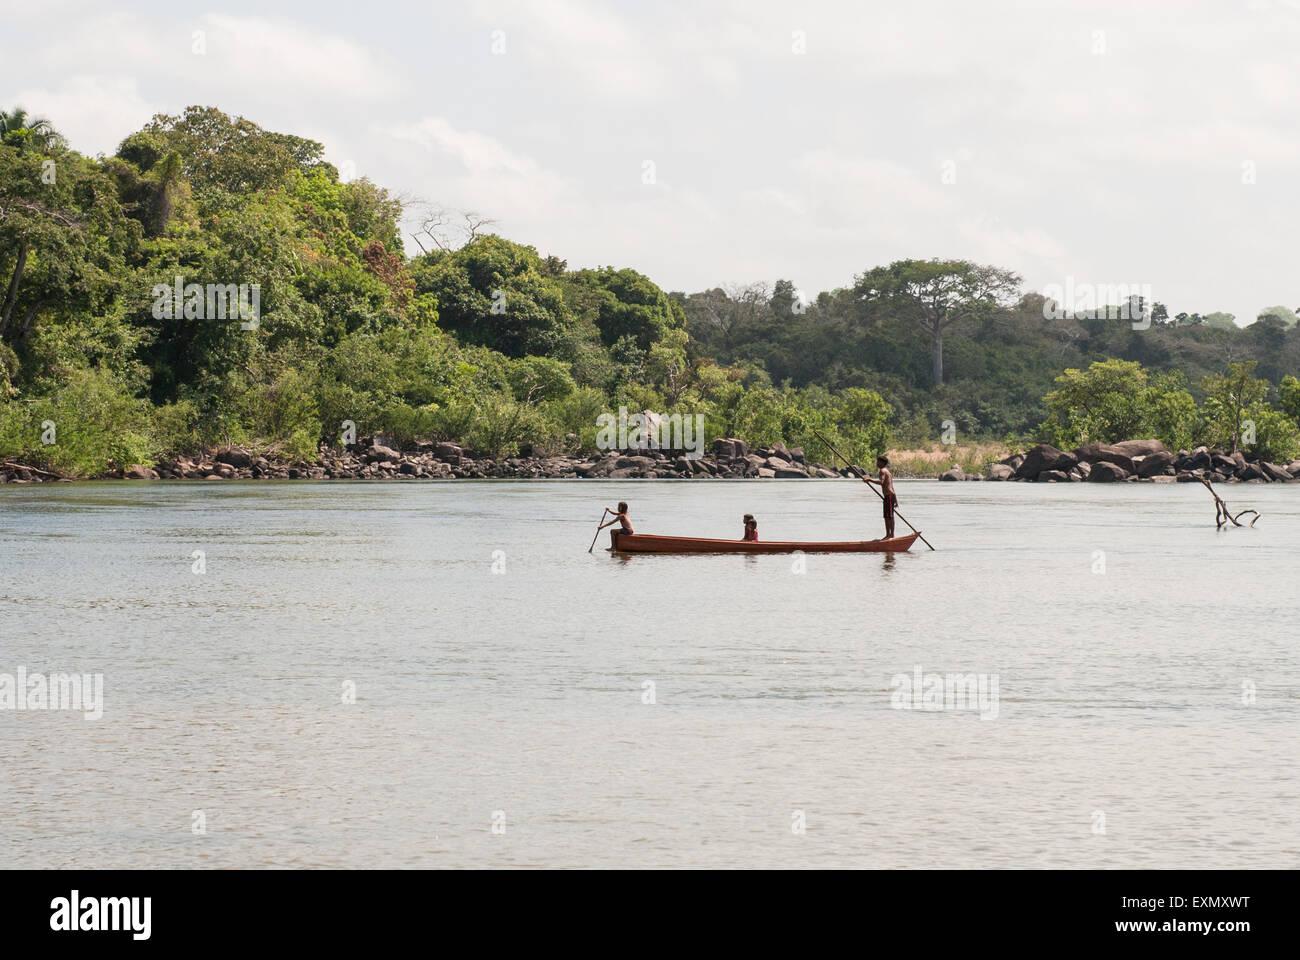 Pakissamba Village (Juruna), Xingu River, Para State, Brazil. Children in a canoe. - Stock Image